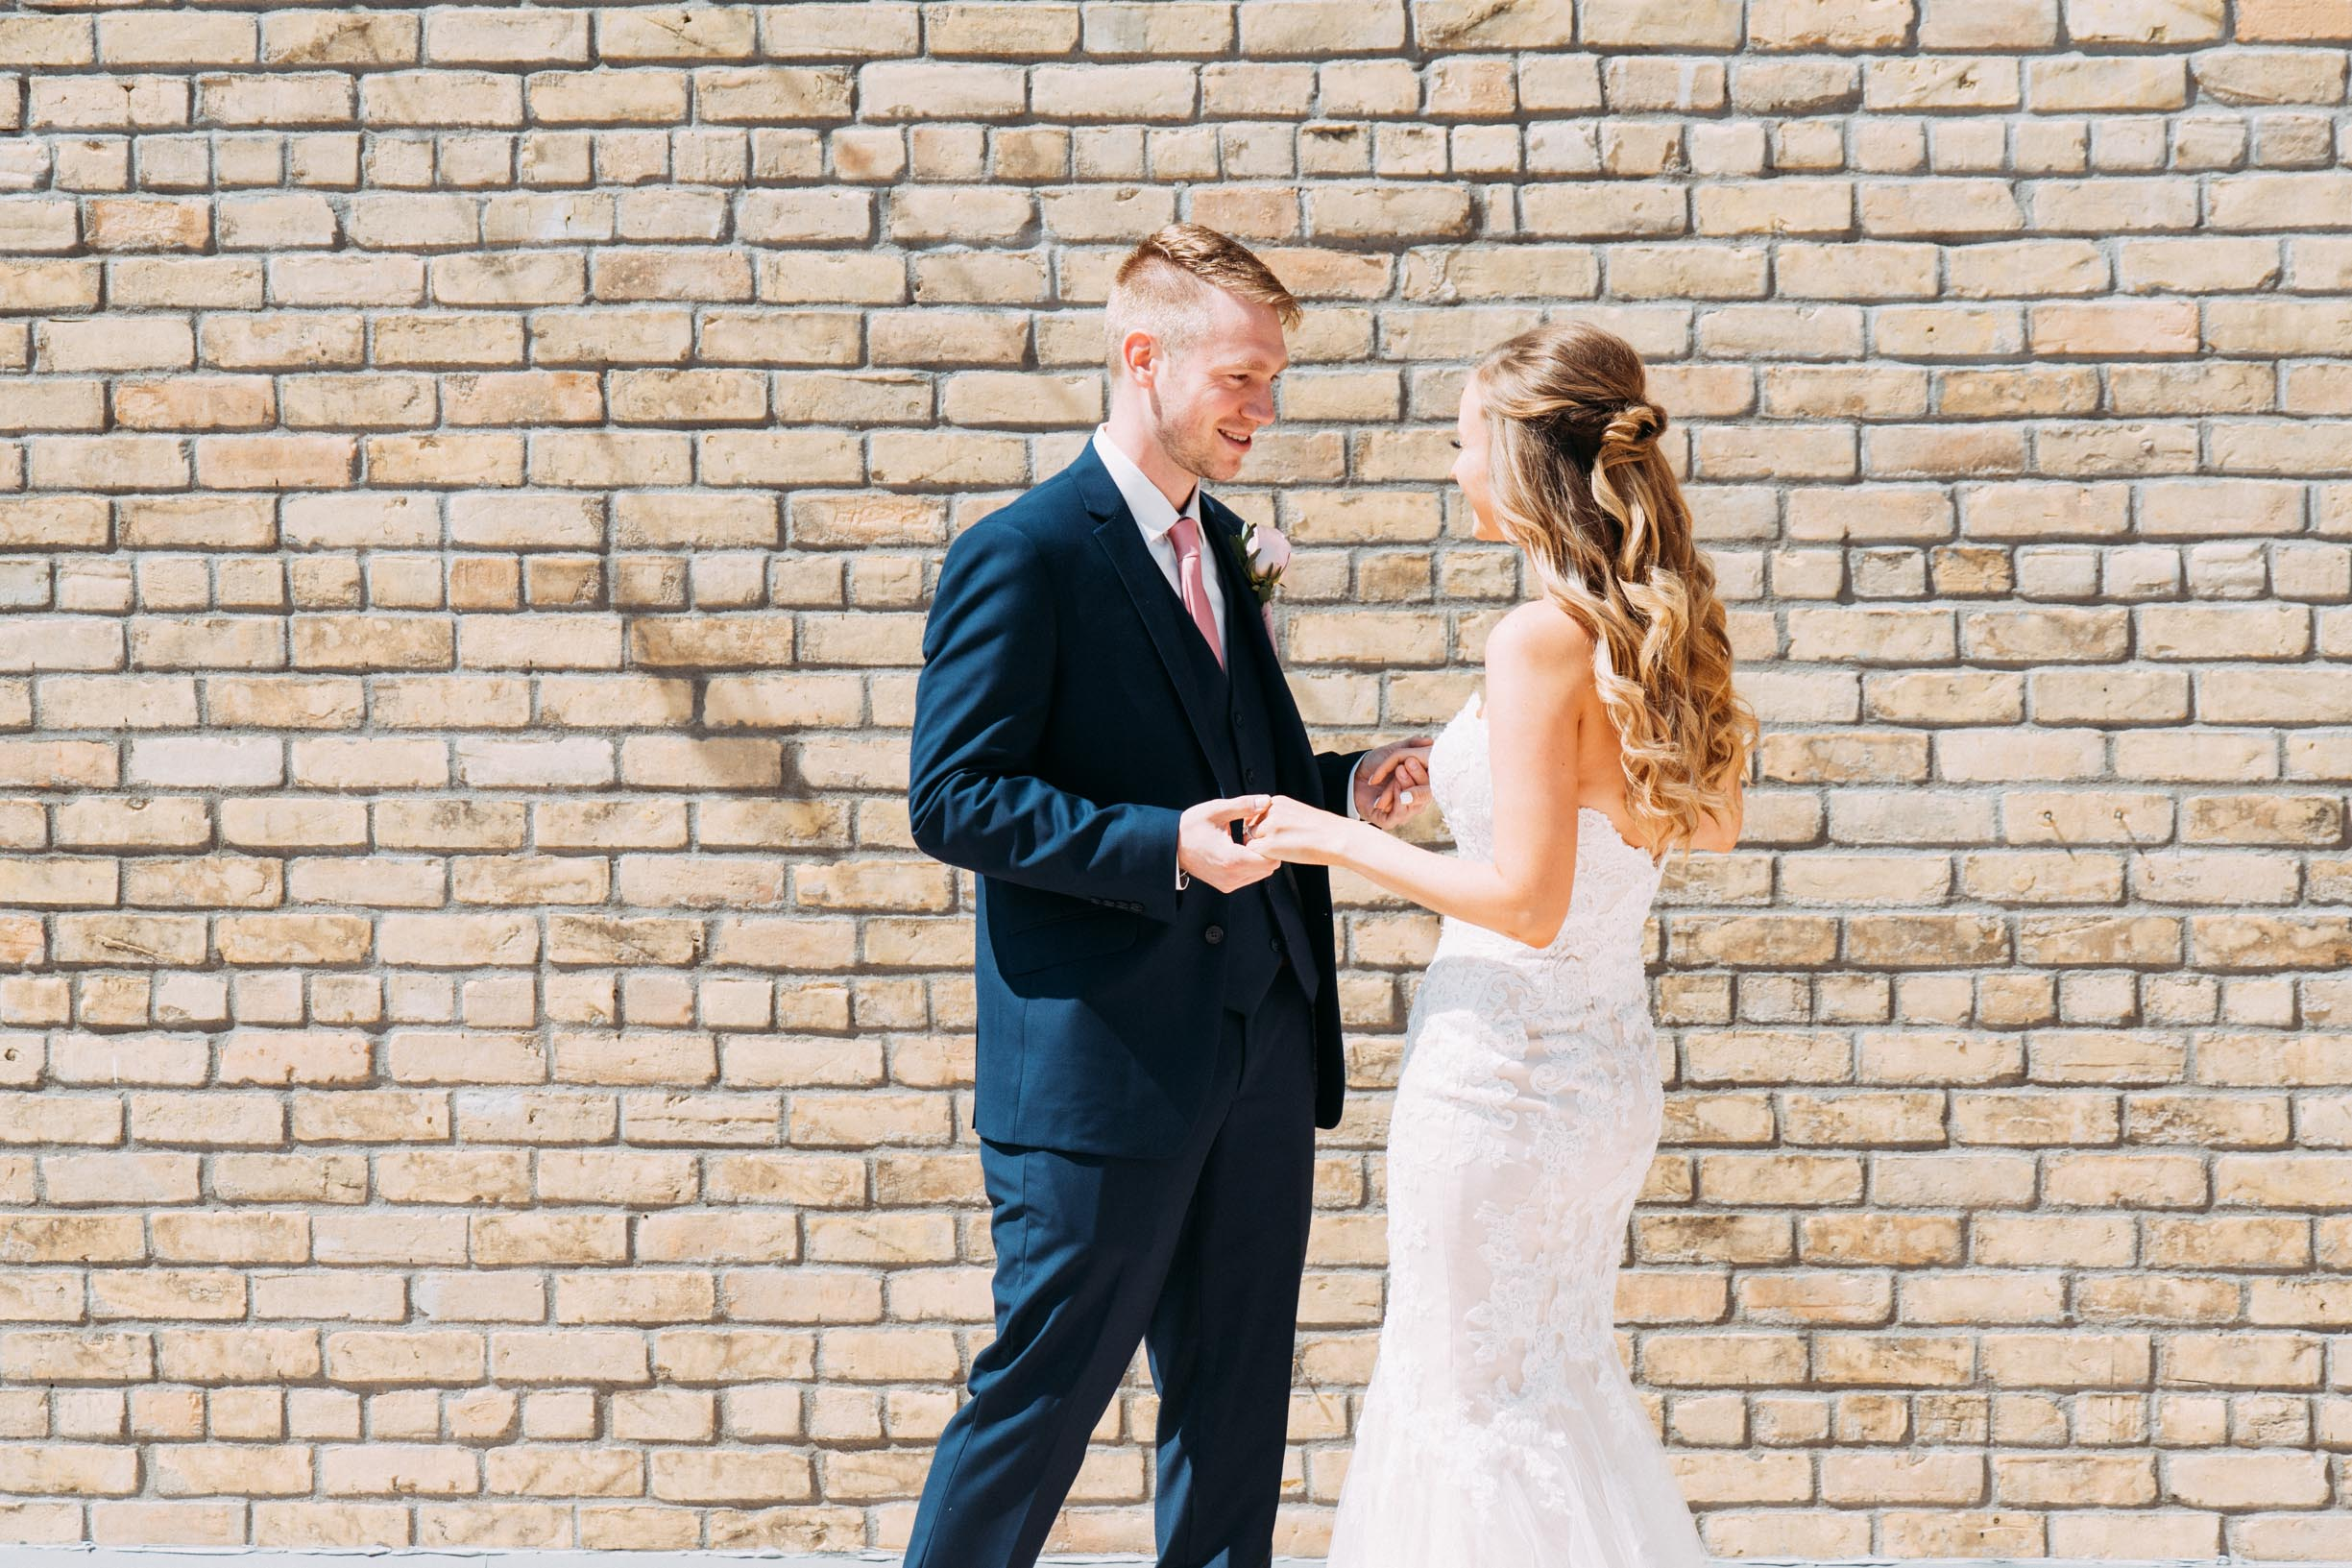 14-WeddingsattheBroz_Minnesota_WeddingBlog.jpg